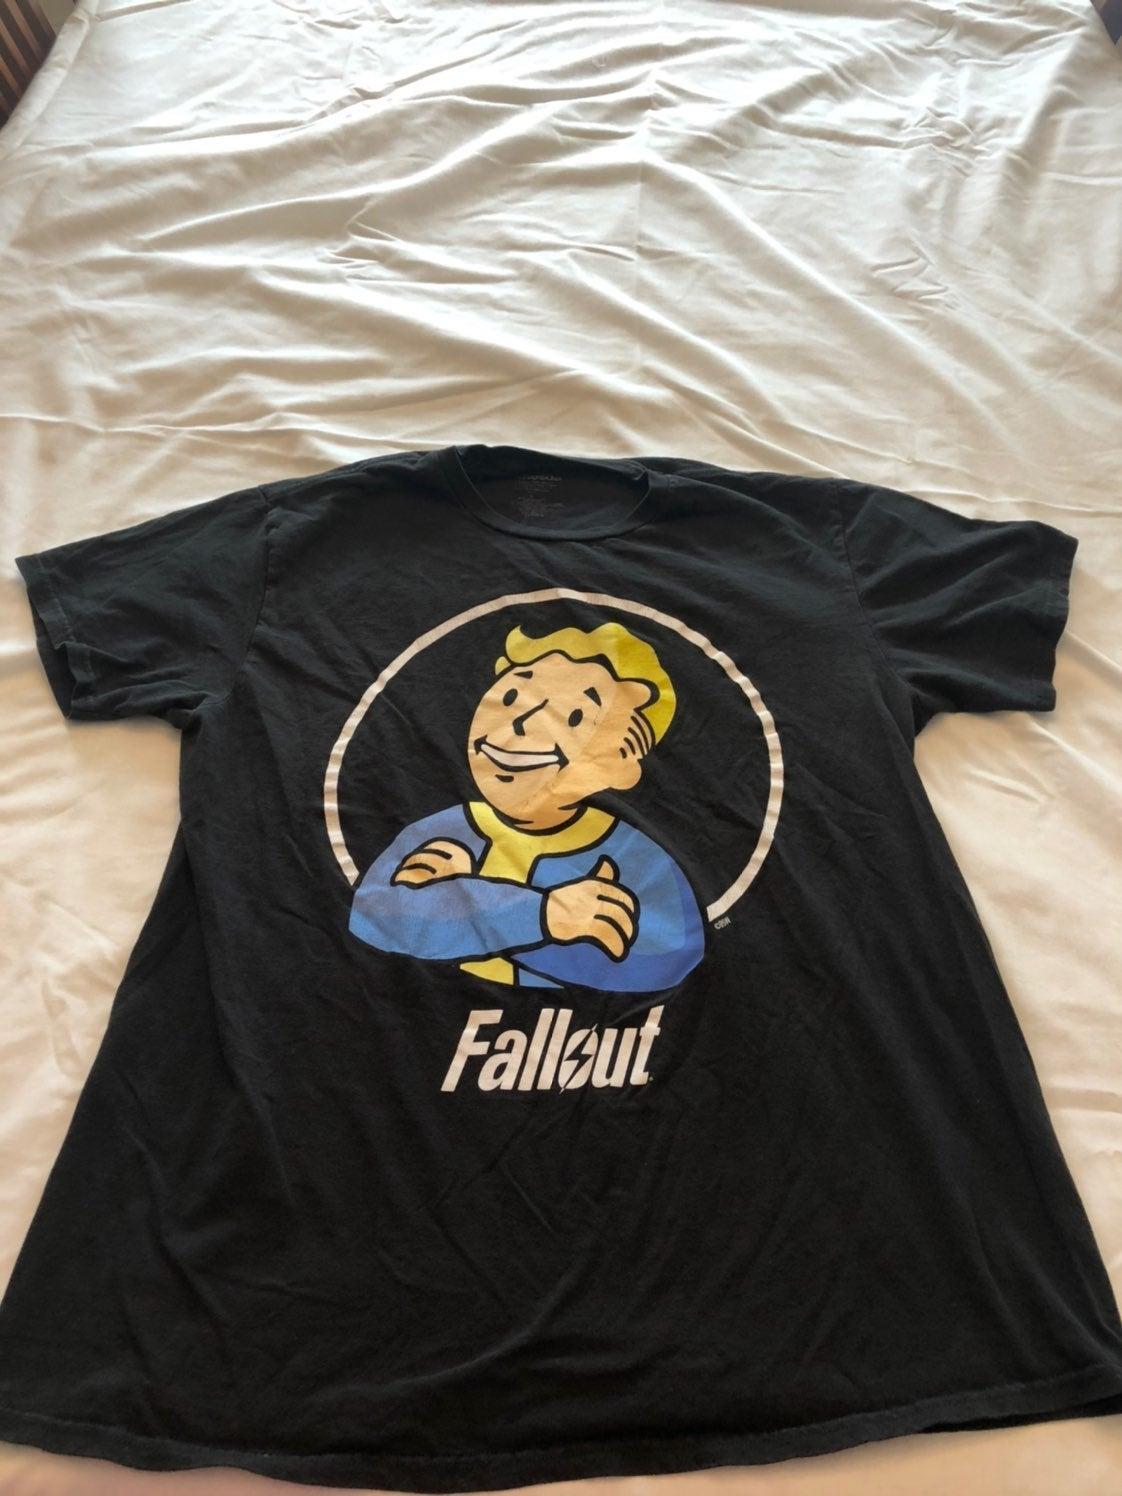 Fallout tshirt